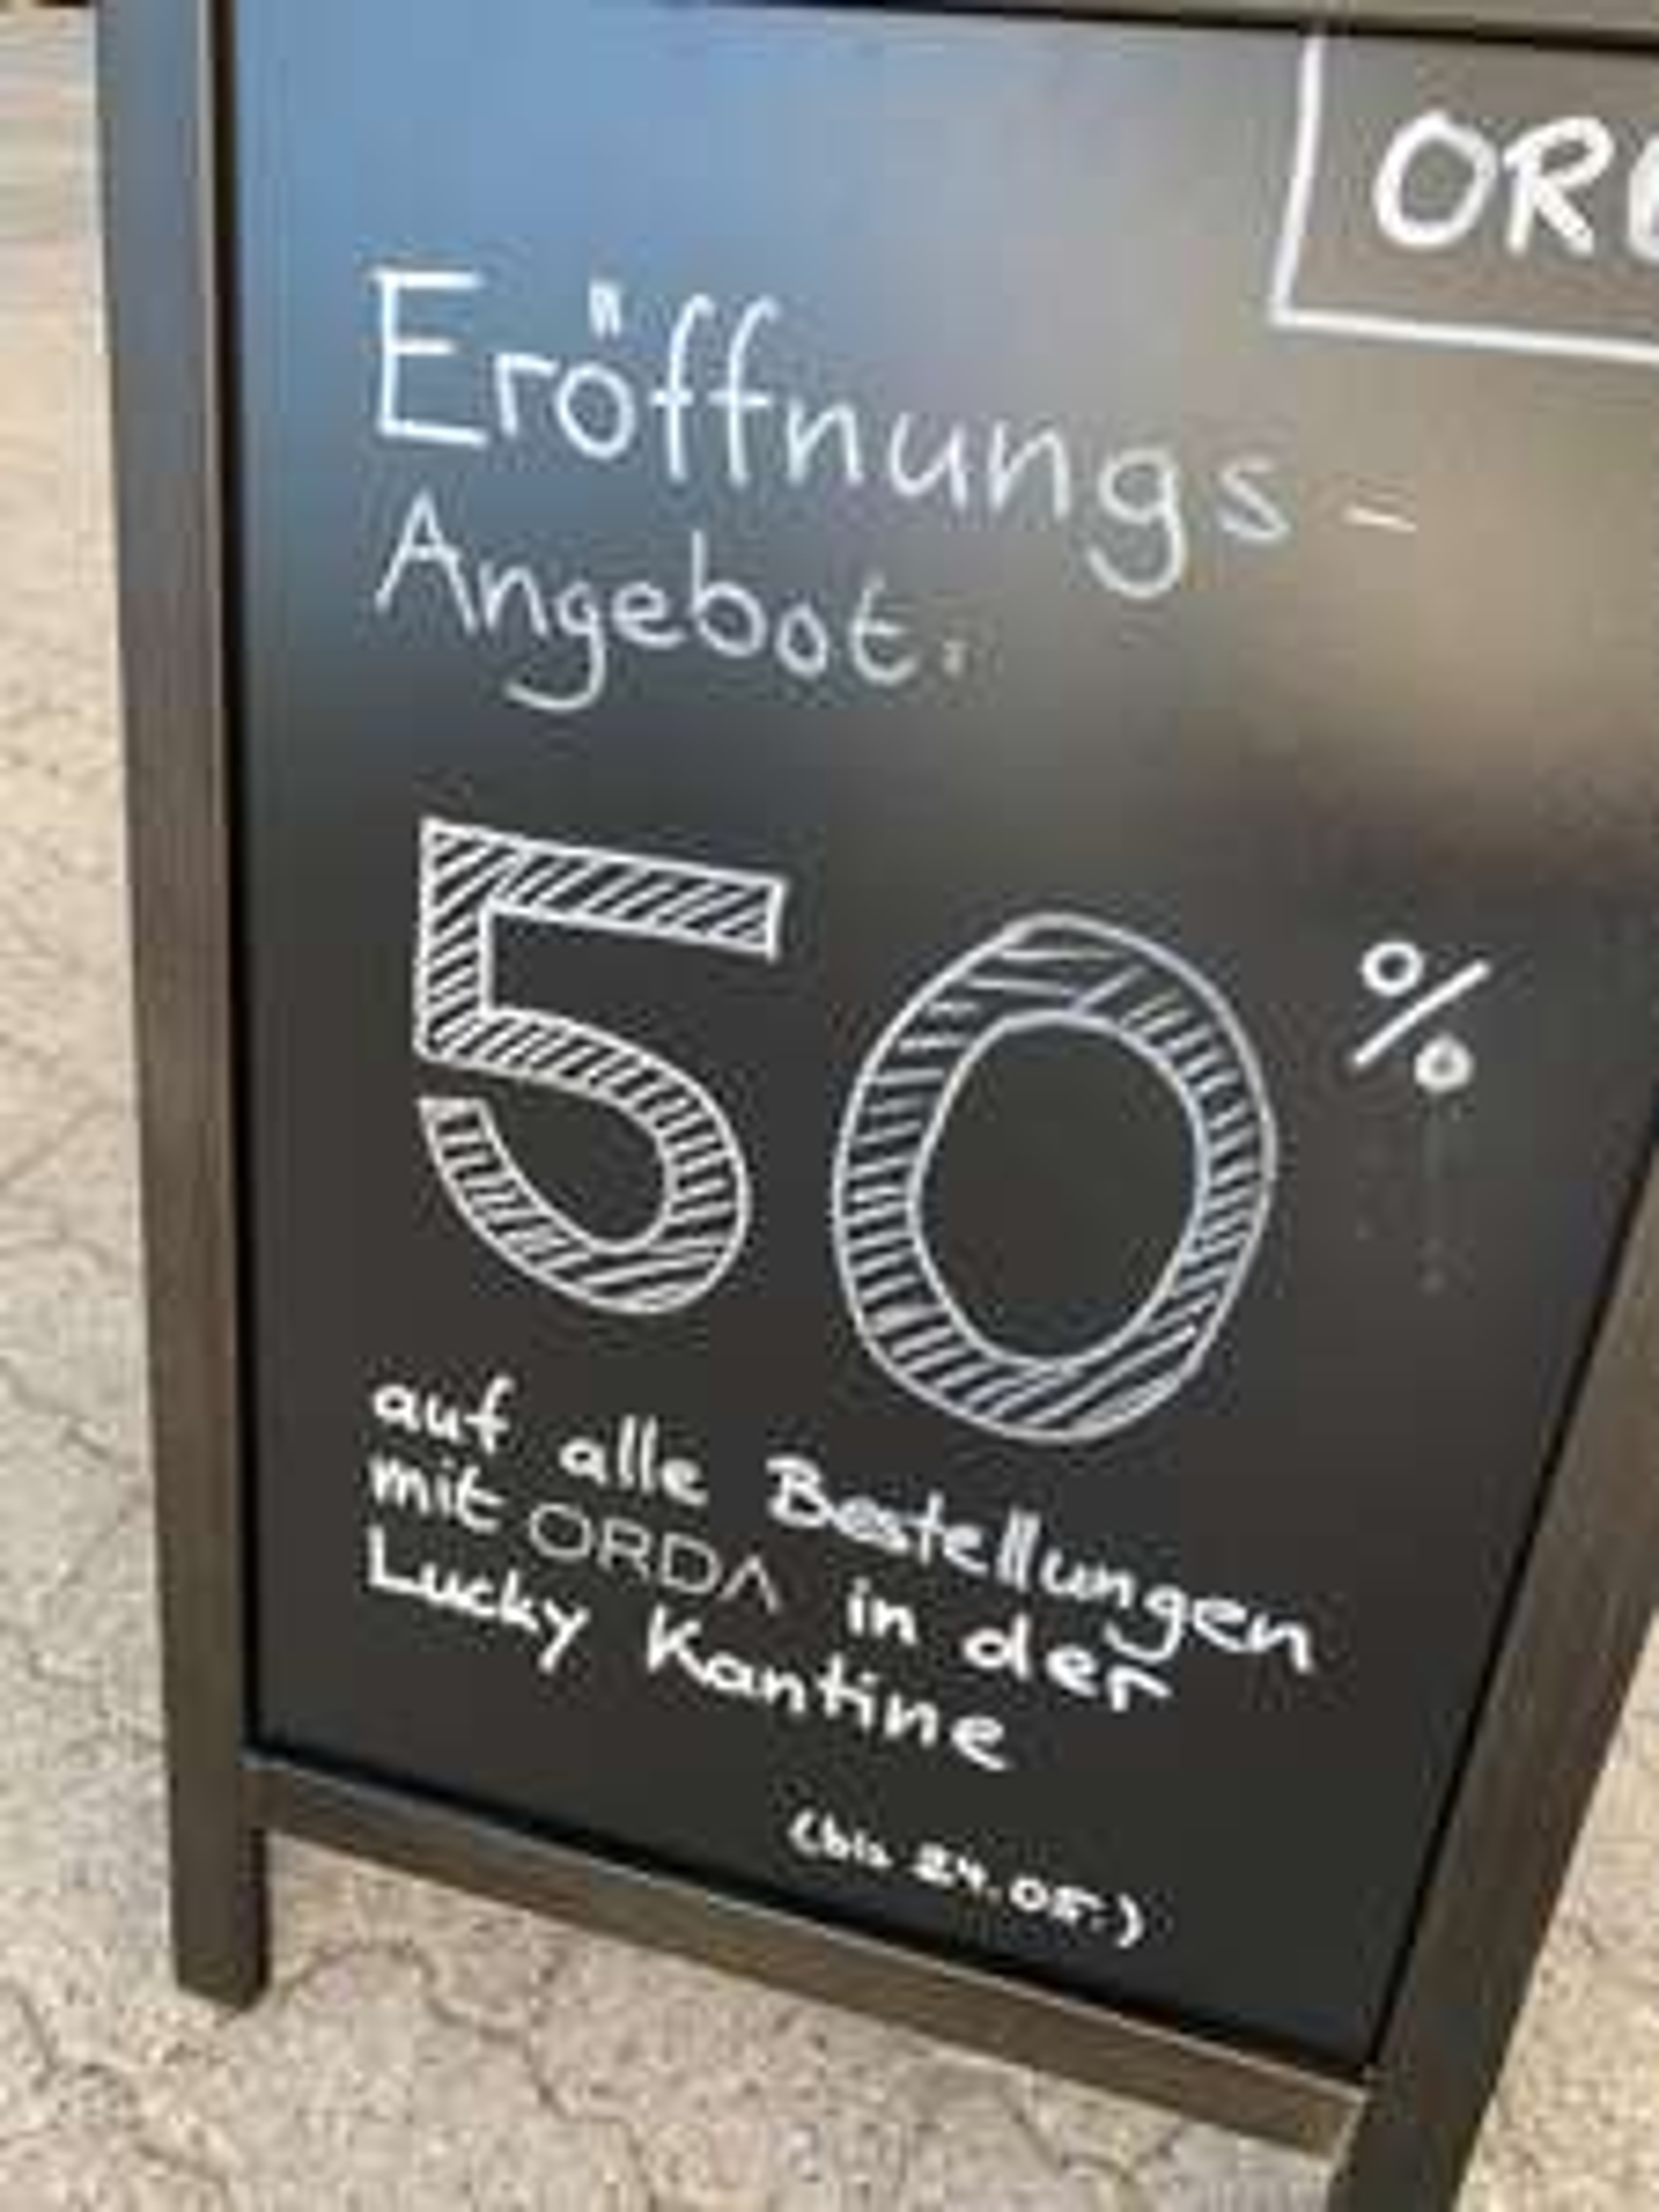 [Lokal München] 50% RABATT über ORDA bei Lucky Kantine (Lucky Who)